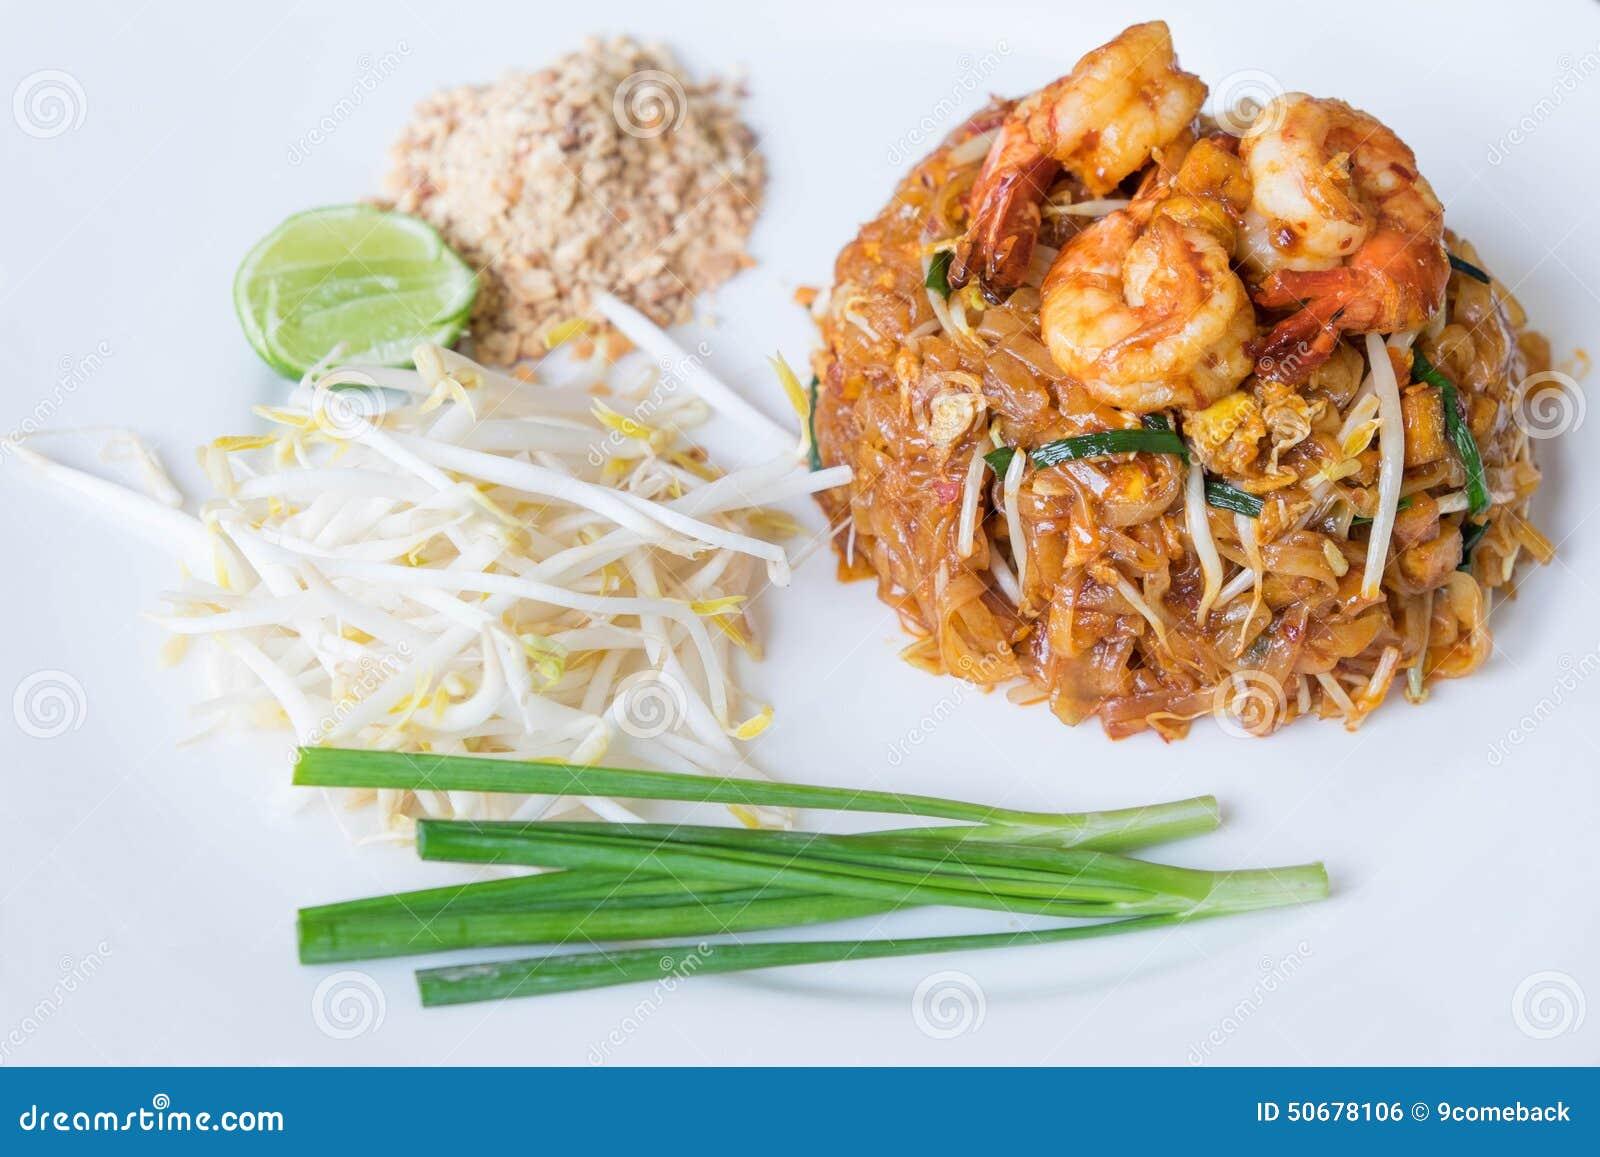 Download Padthai 库存照片. 图片 包括有 面条, 蔬菜, 查出, 背包, 样式, 填充, 混乱, 素食主义者 - 50678106